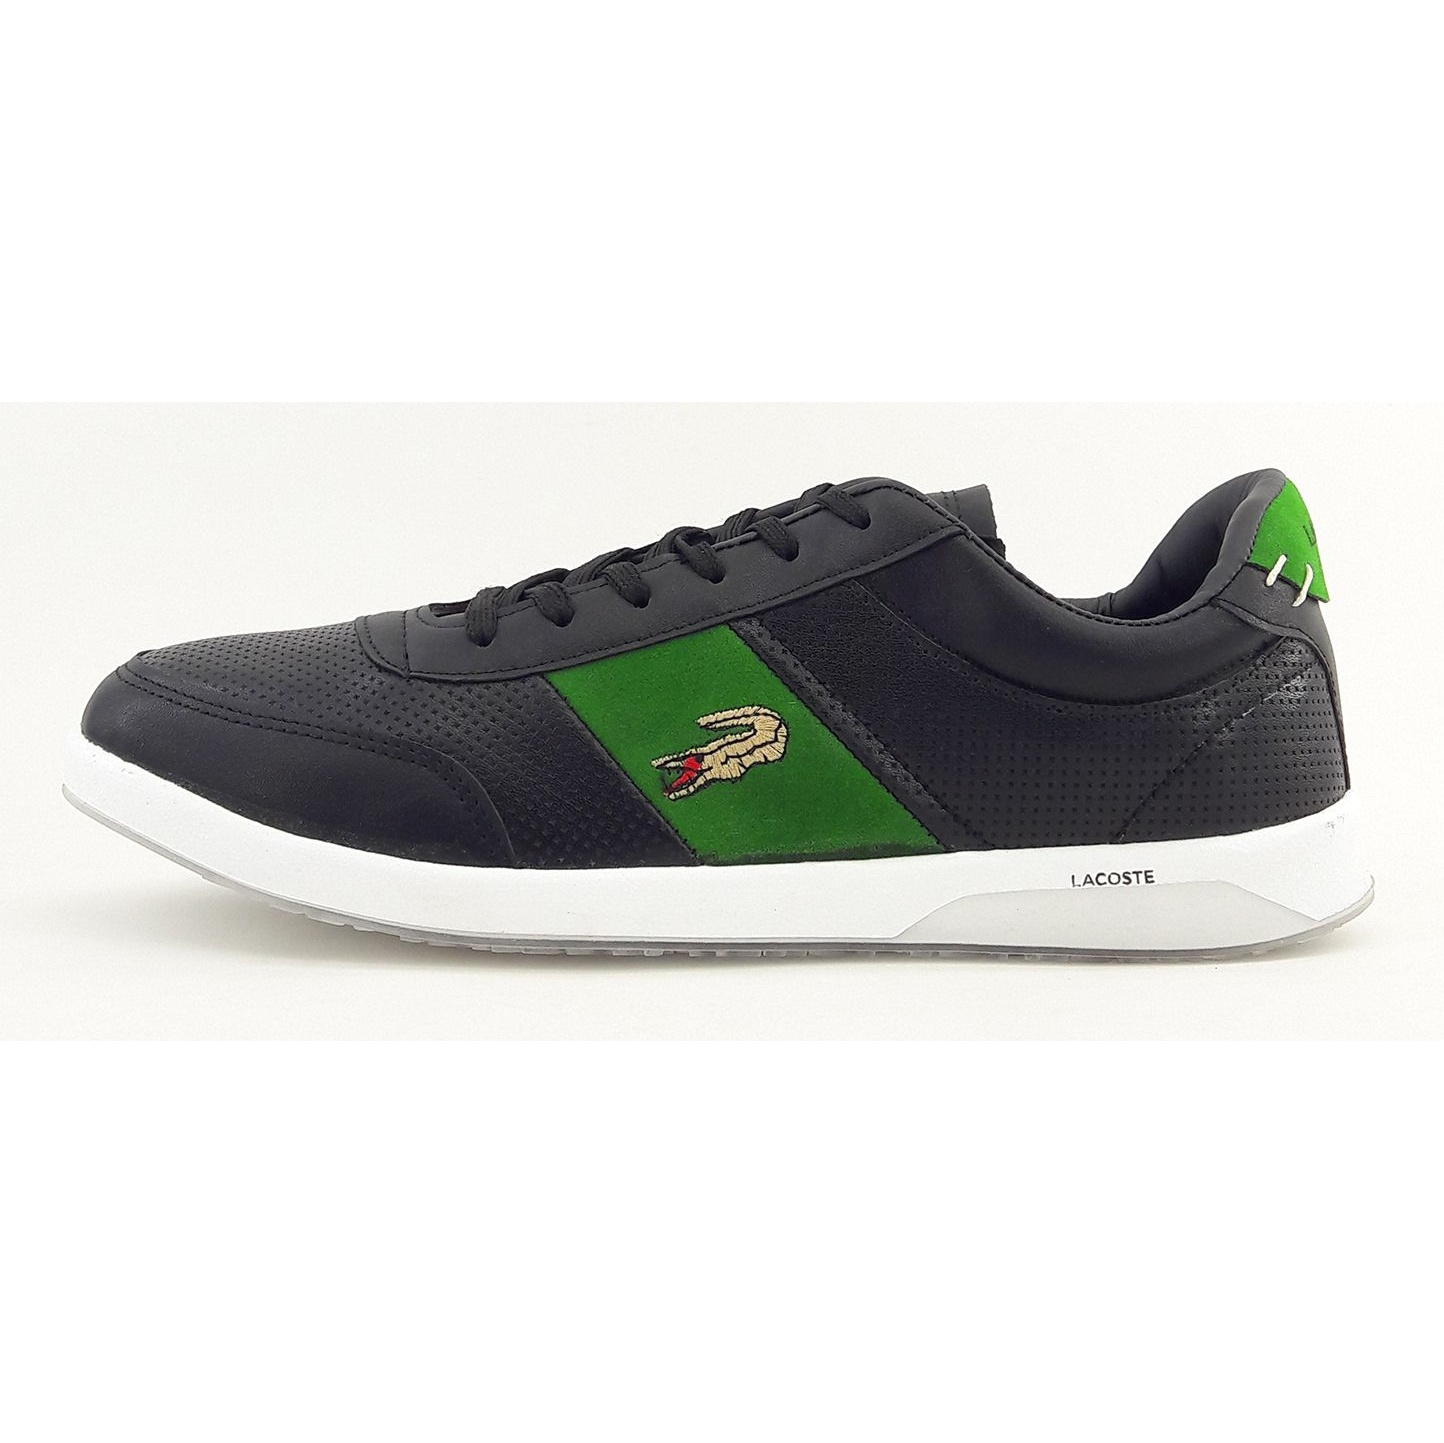 خرید                      کفش  پیاده روی مردانه مدل Lst bl.gr.gel001